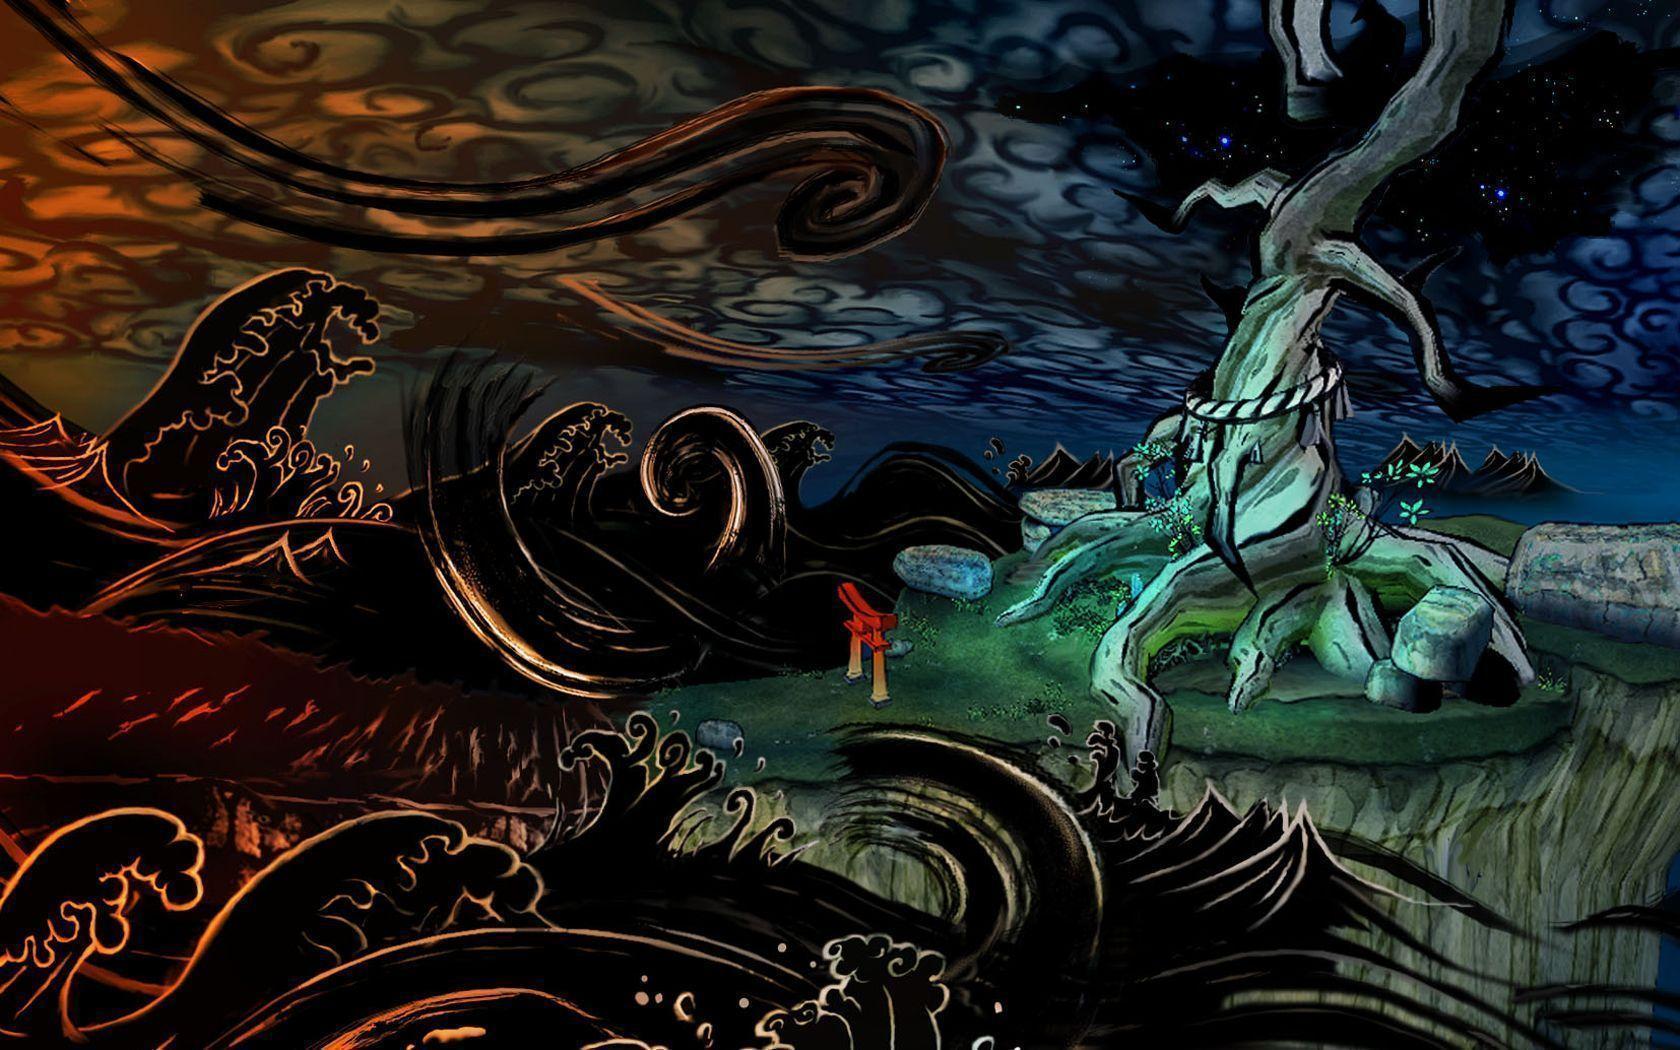 Free Tsunami of Darkness Wallpapers, Free Tsunami of Darkness HD ...